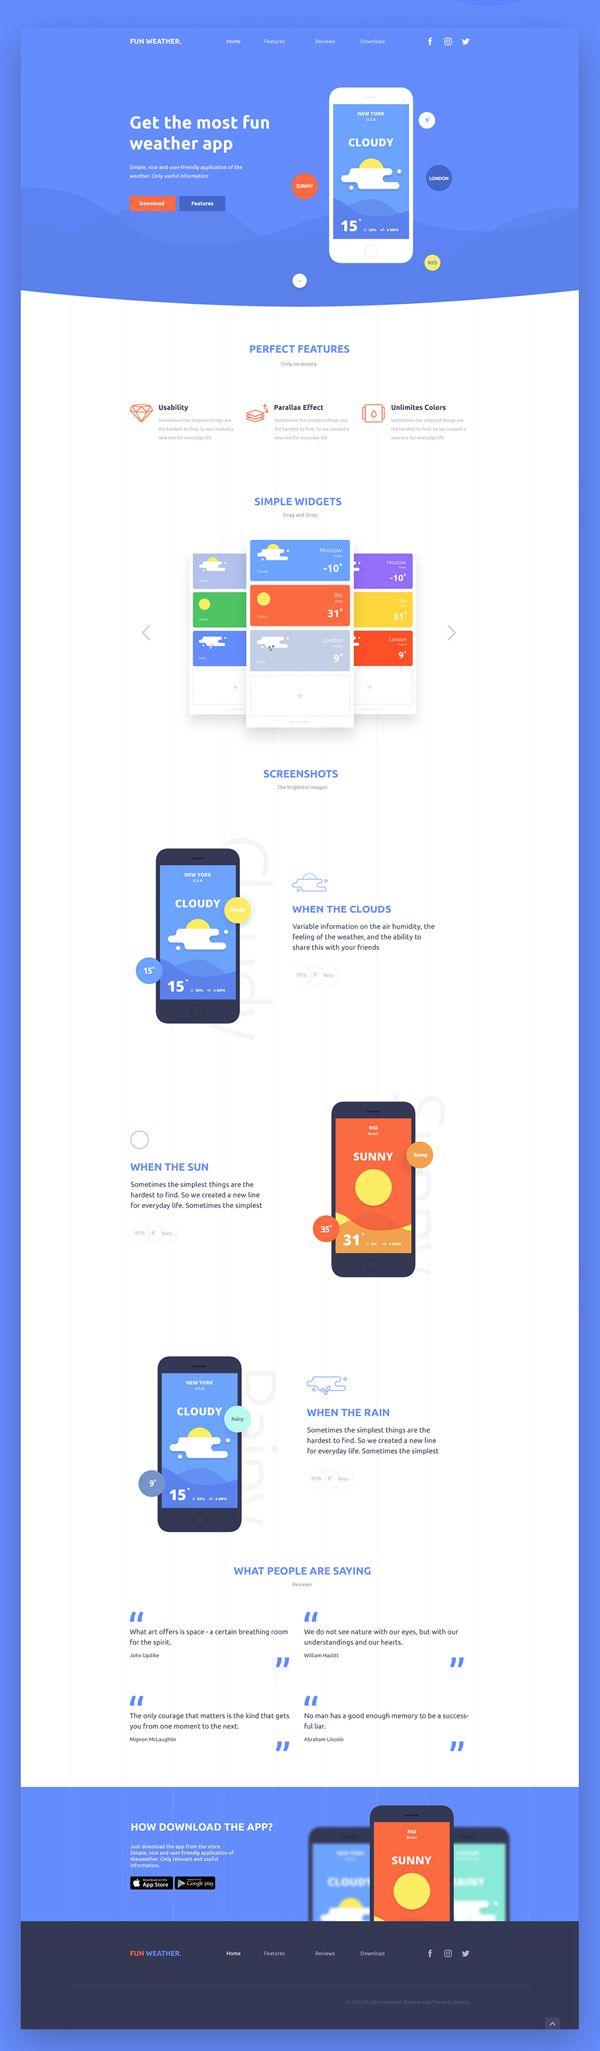 Free PSD Landing Page (Weather App) #freebies #psdgraphics #freepsdfiles #mockupdesign #webtemplate #uidesign